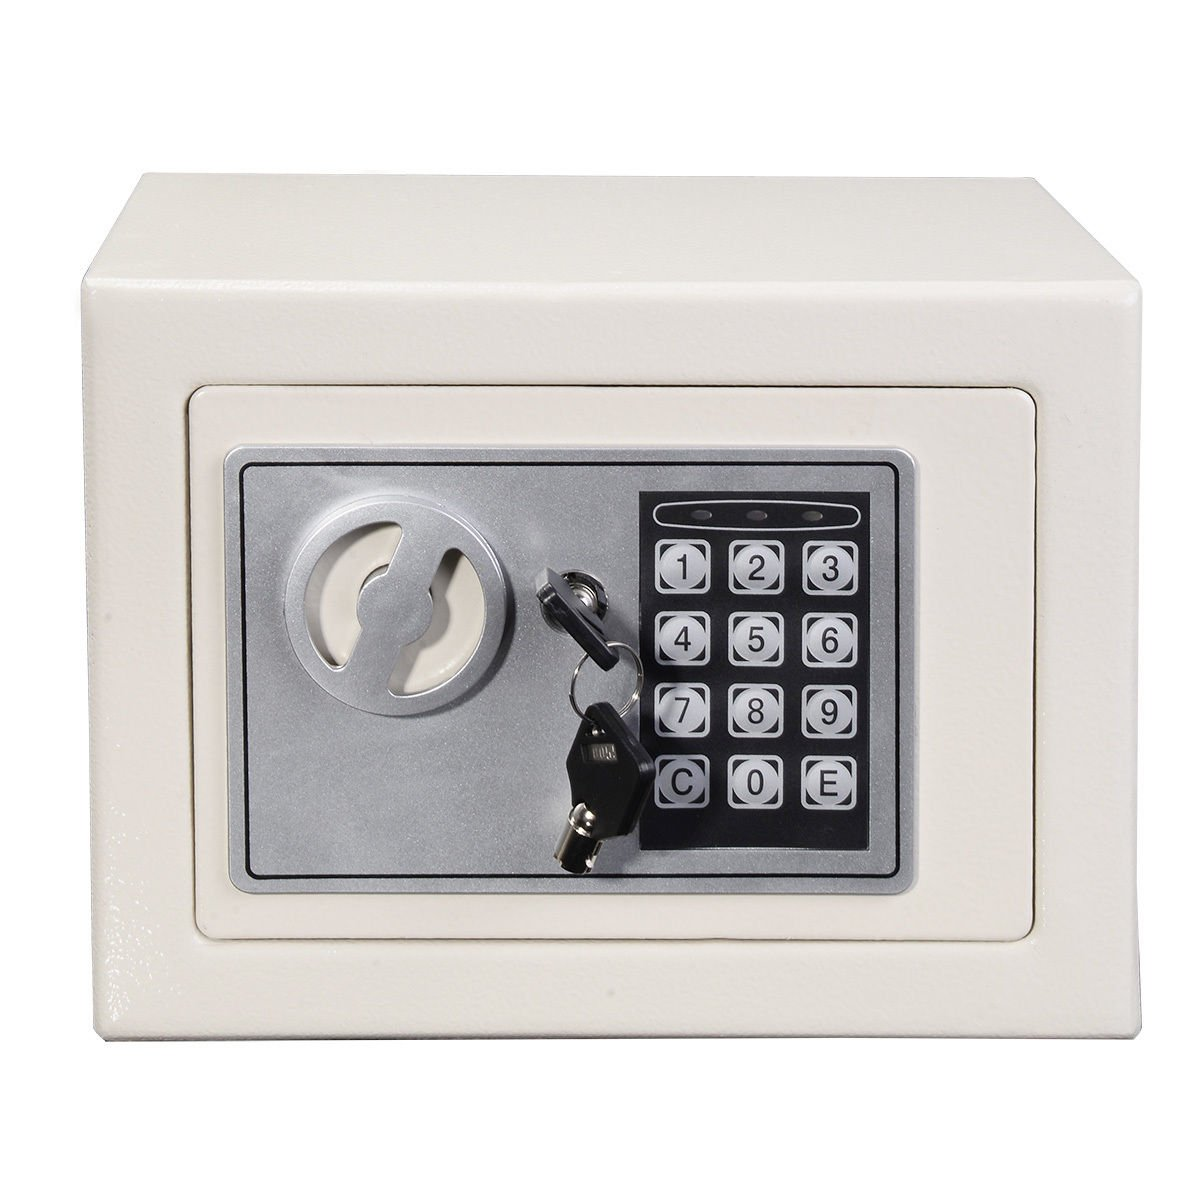 shindak新しいSmallホワイトデジタル電子セーフボックスキーパッドロックホームオフィスホテルガン B01HRLHCH8